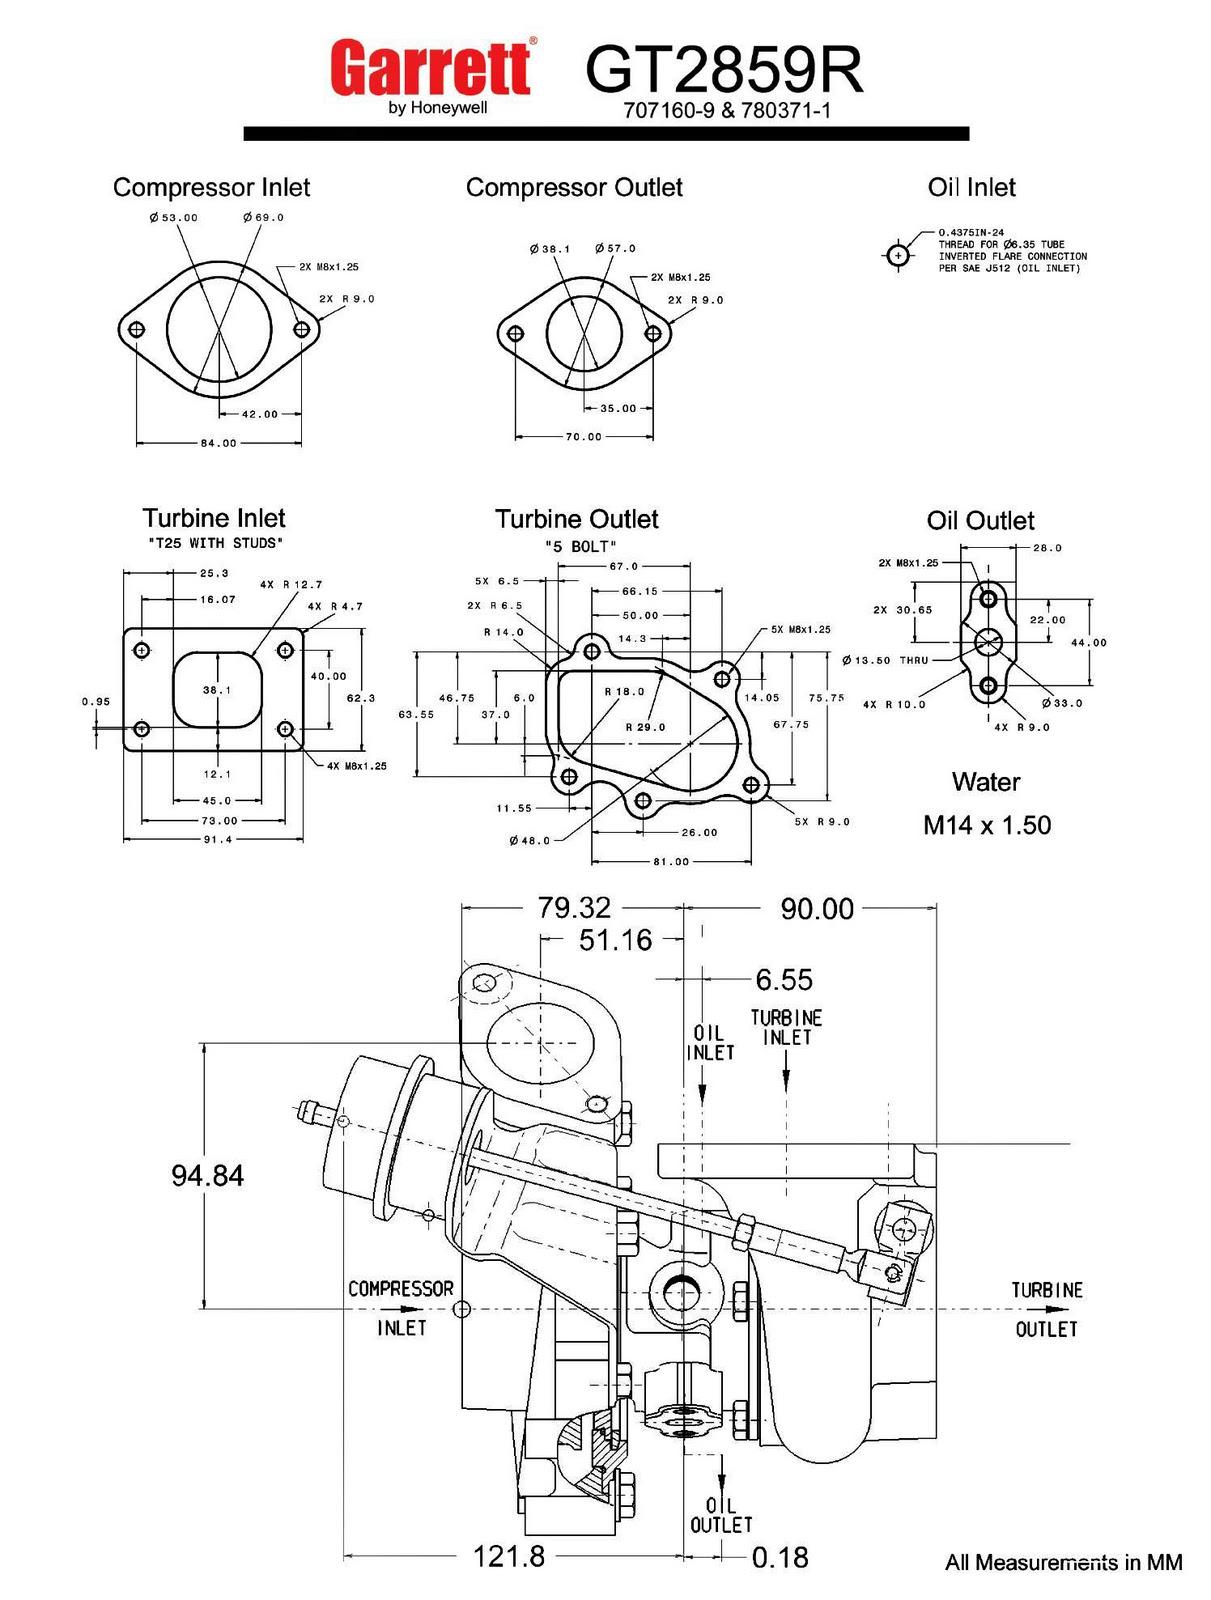 garrett gt28r turbo gt2859r dual ball bearing measurements in mm turbocharger flanges diameter turbo flange honeywell 1496x1977 [ 1211 x 1600 Pixel ]